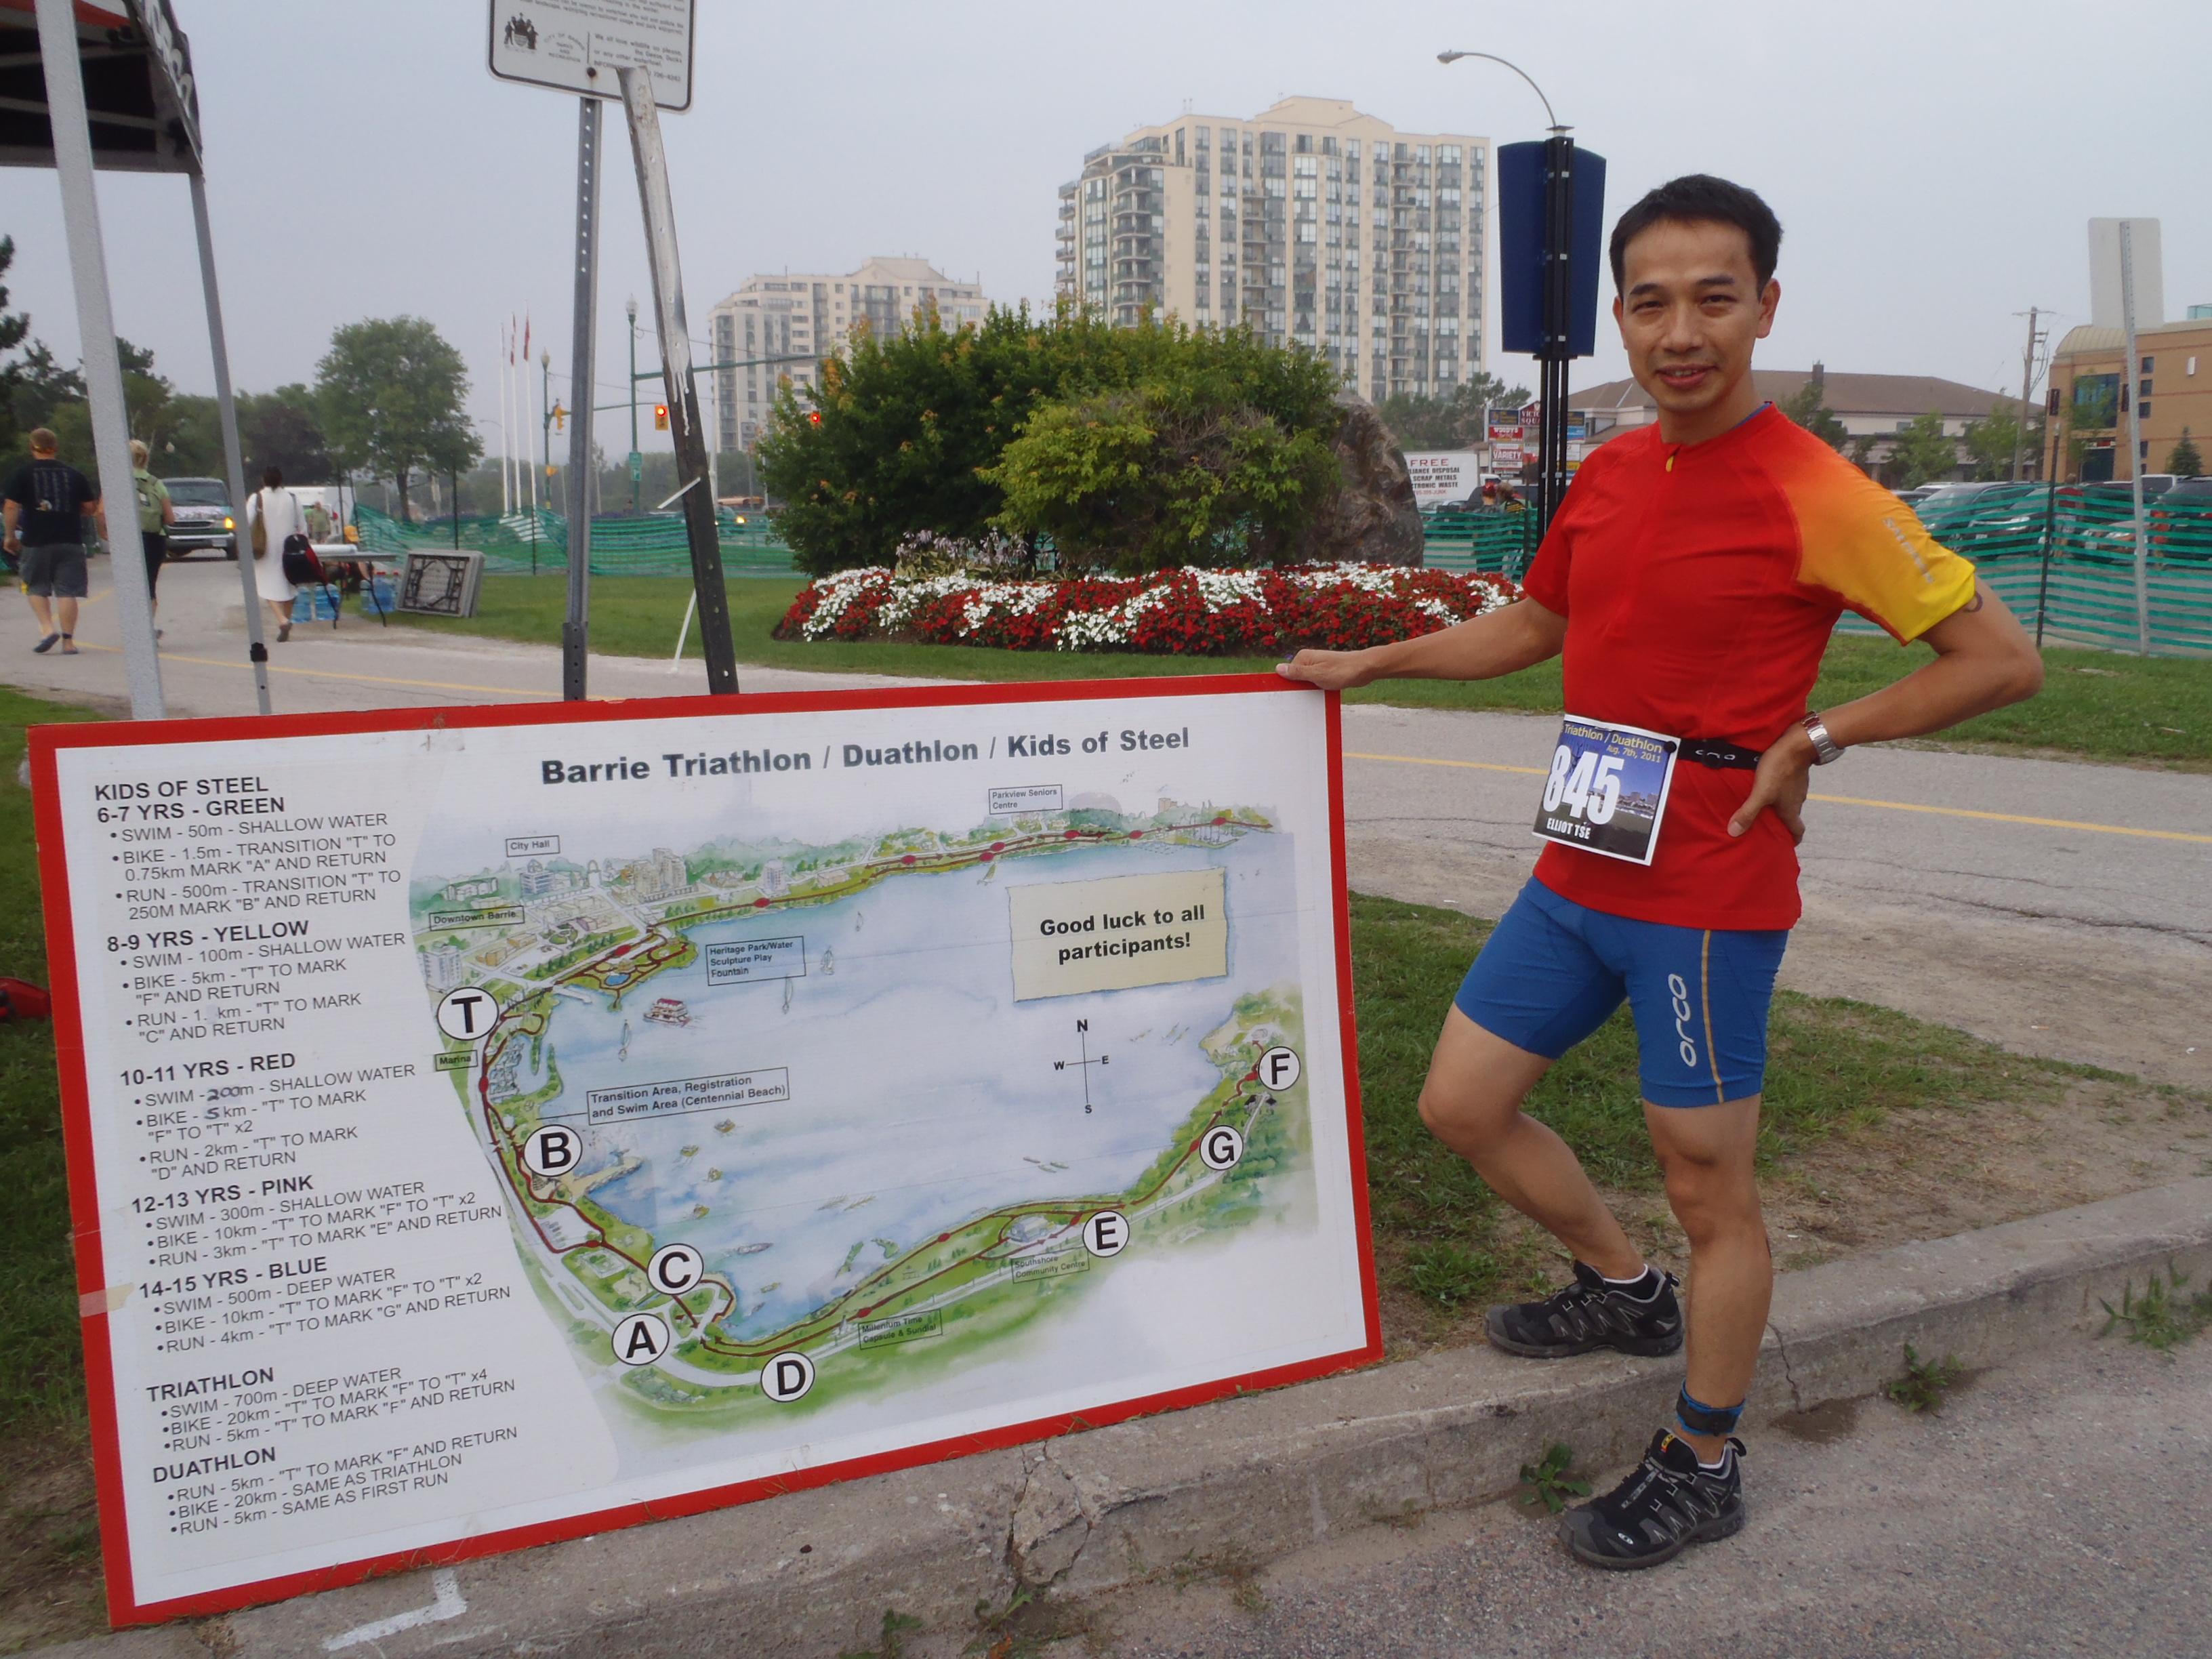 Barrie Triathlon 2011